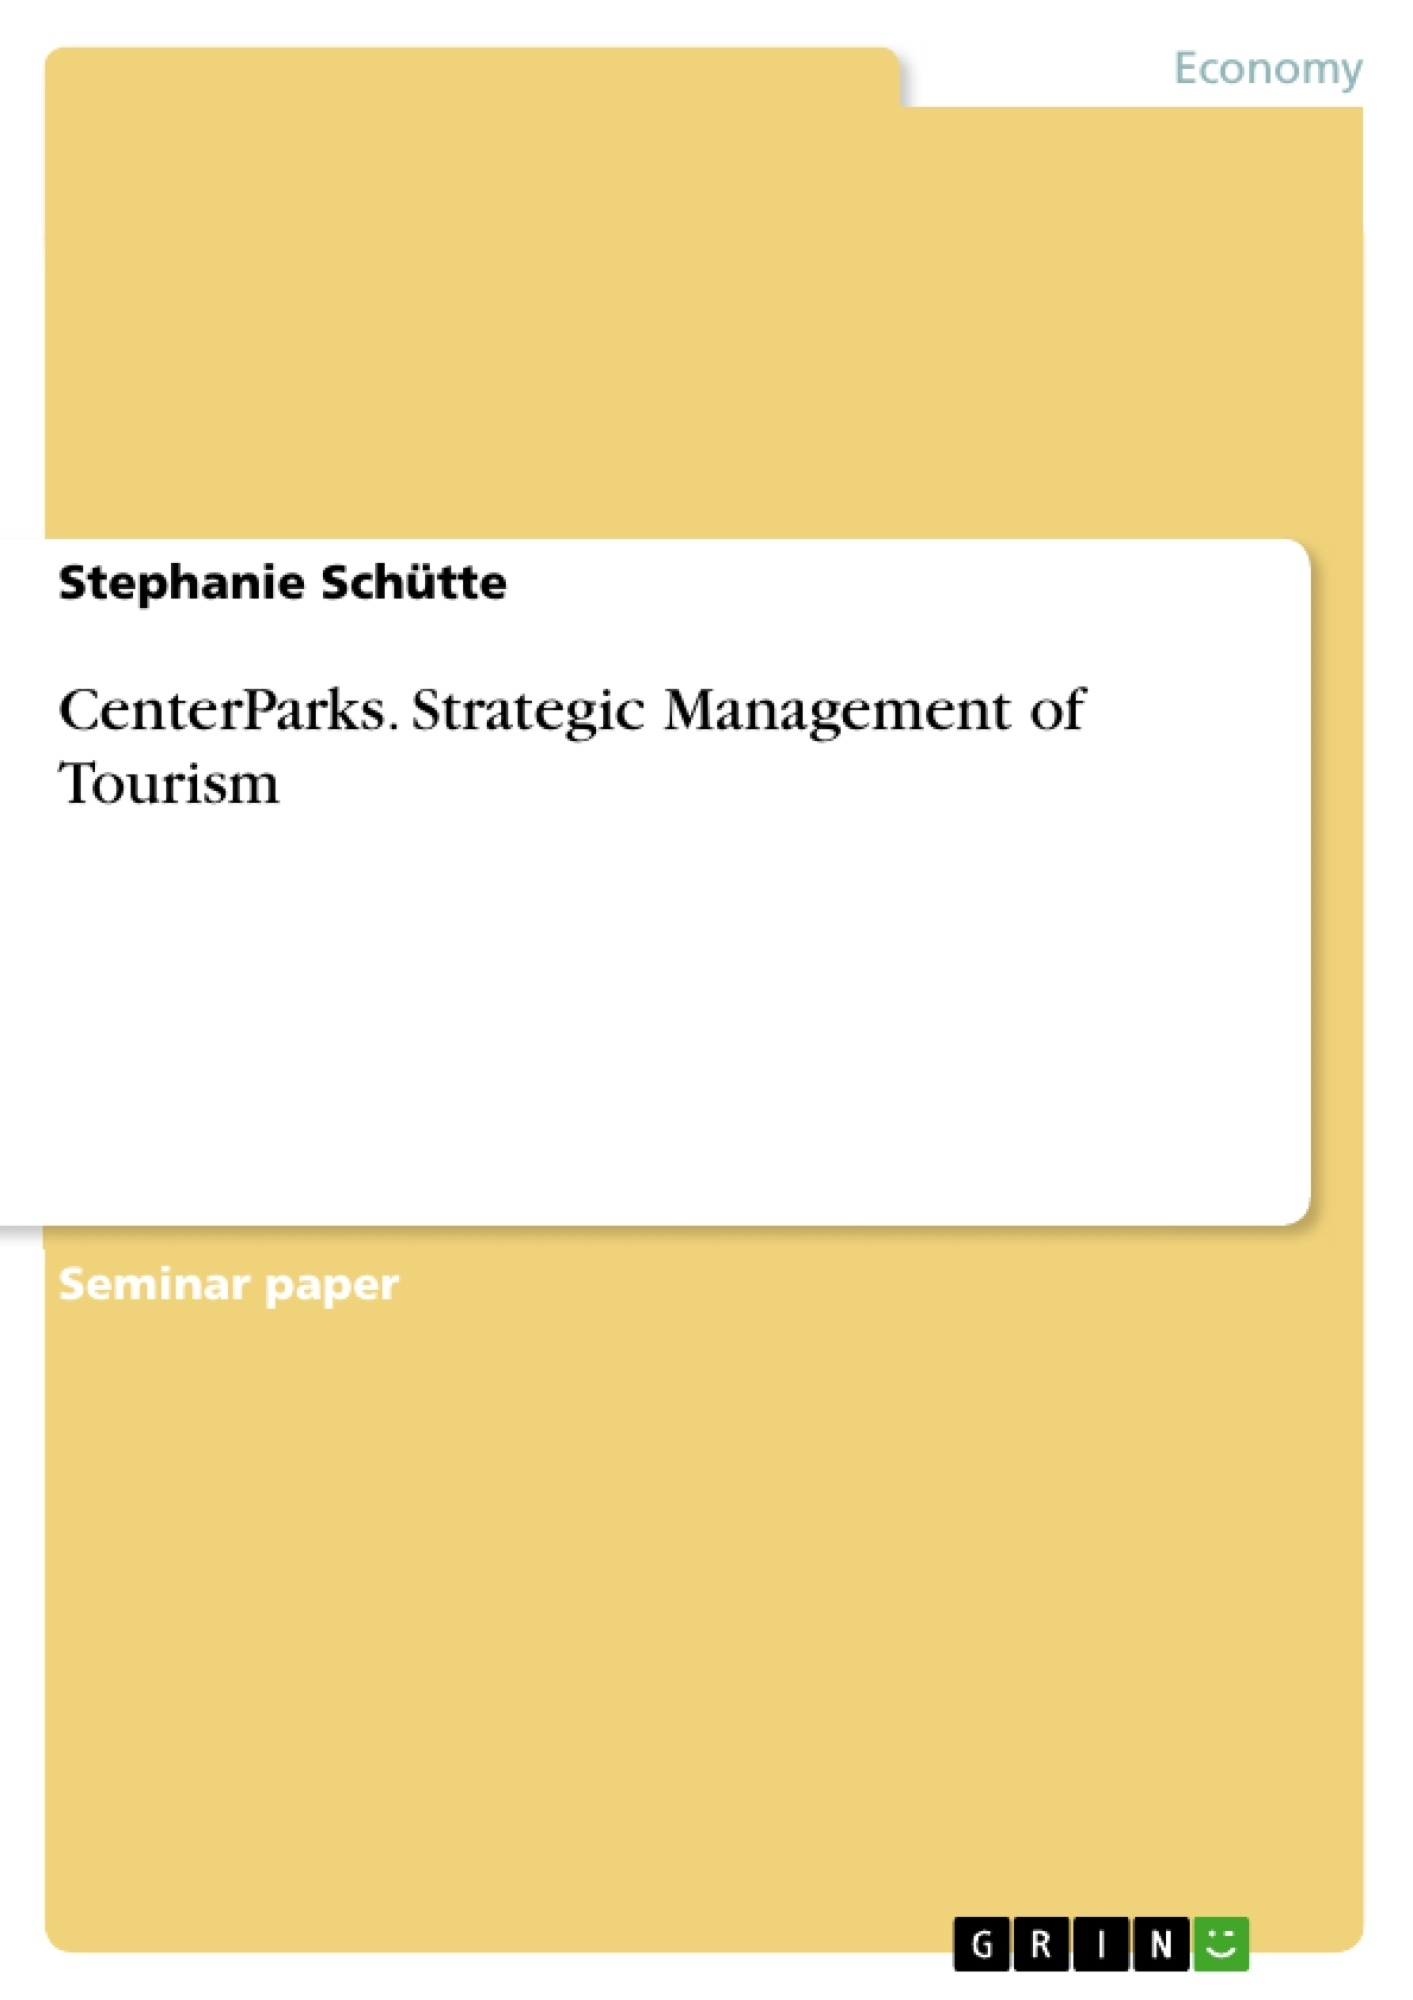 Title: CenterParks. Strategic Management of Tourism